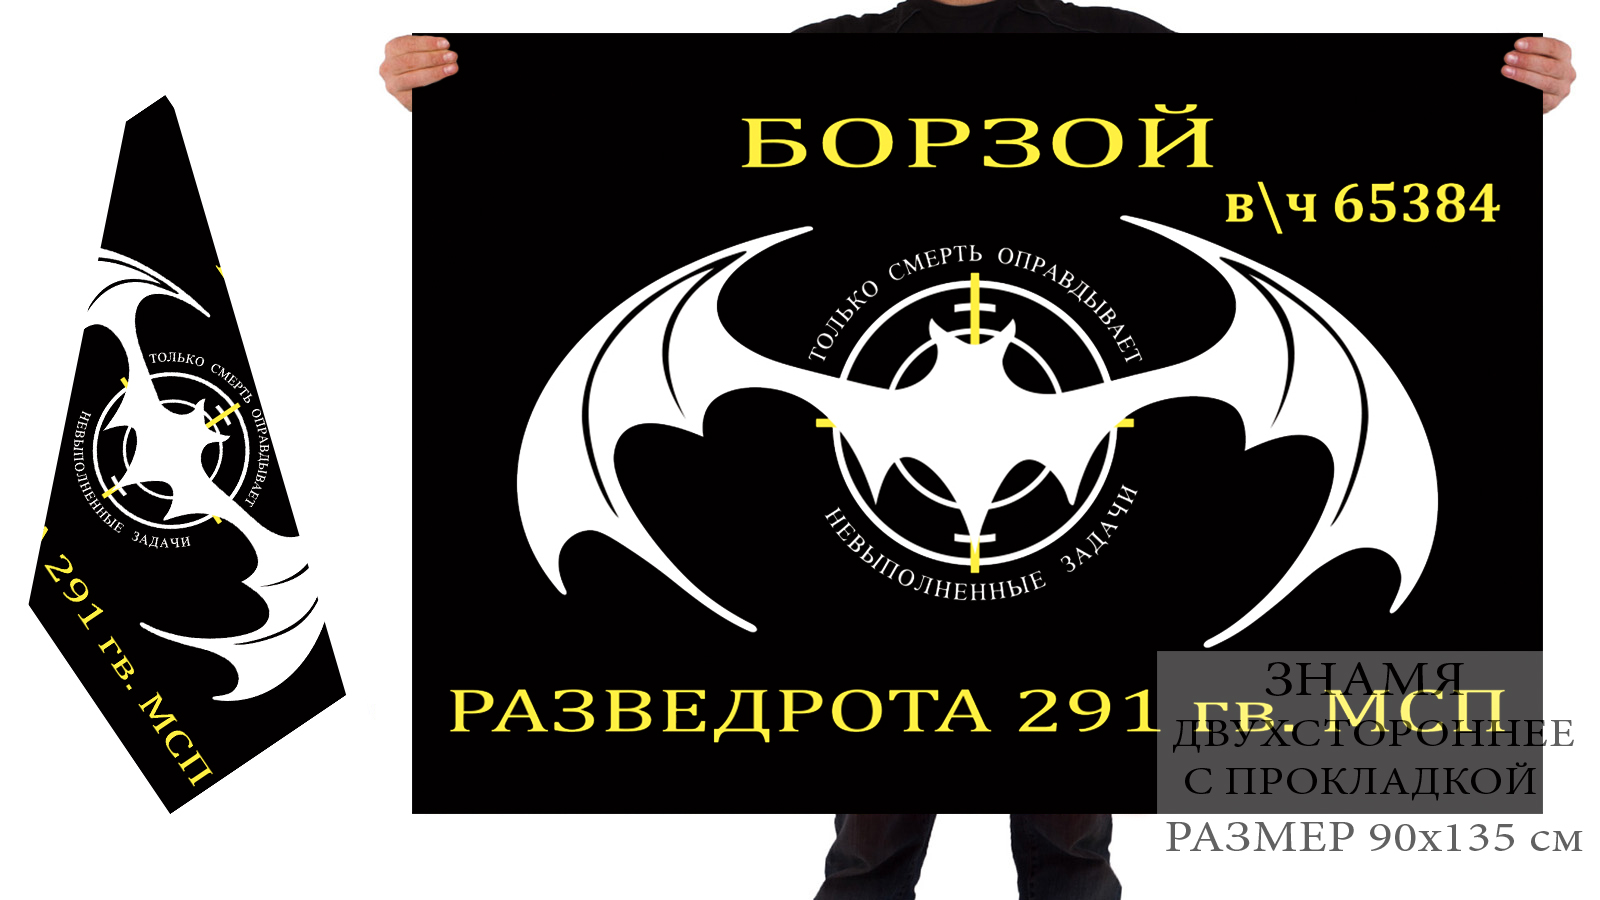 Двусторонний флаг разведроты 291 гв. МСП спецназа ГРУ